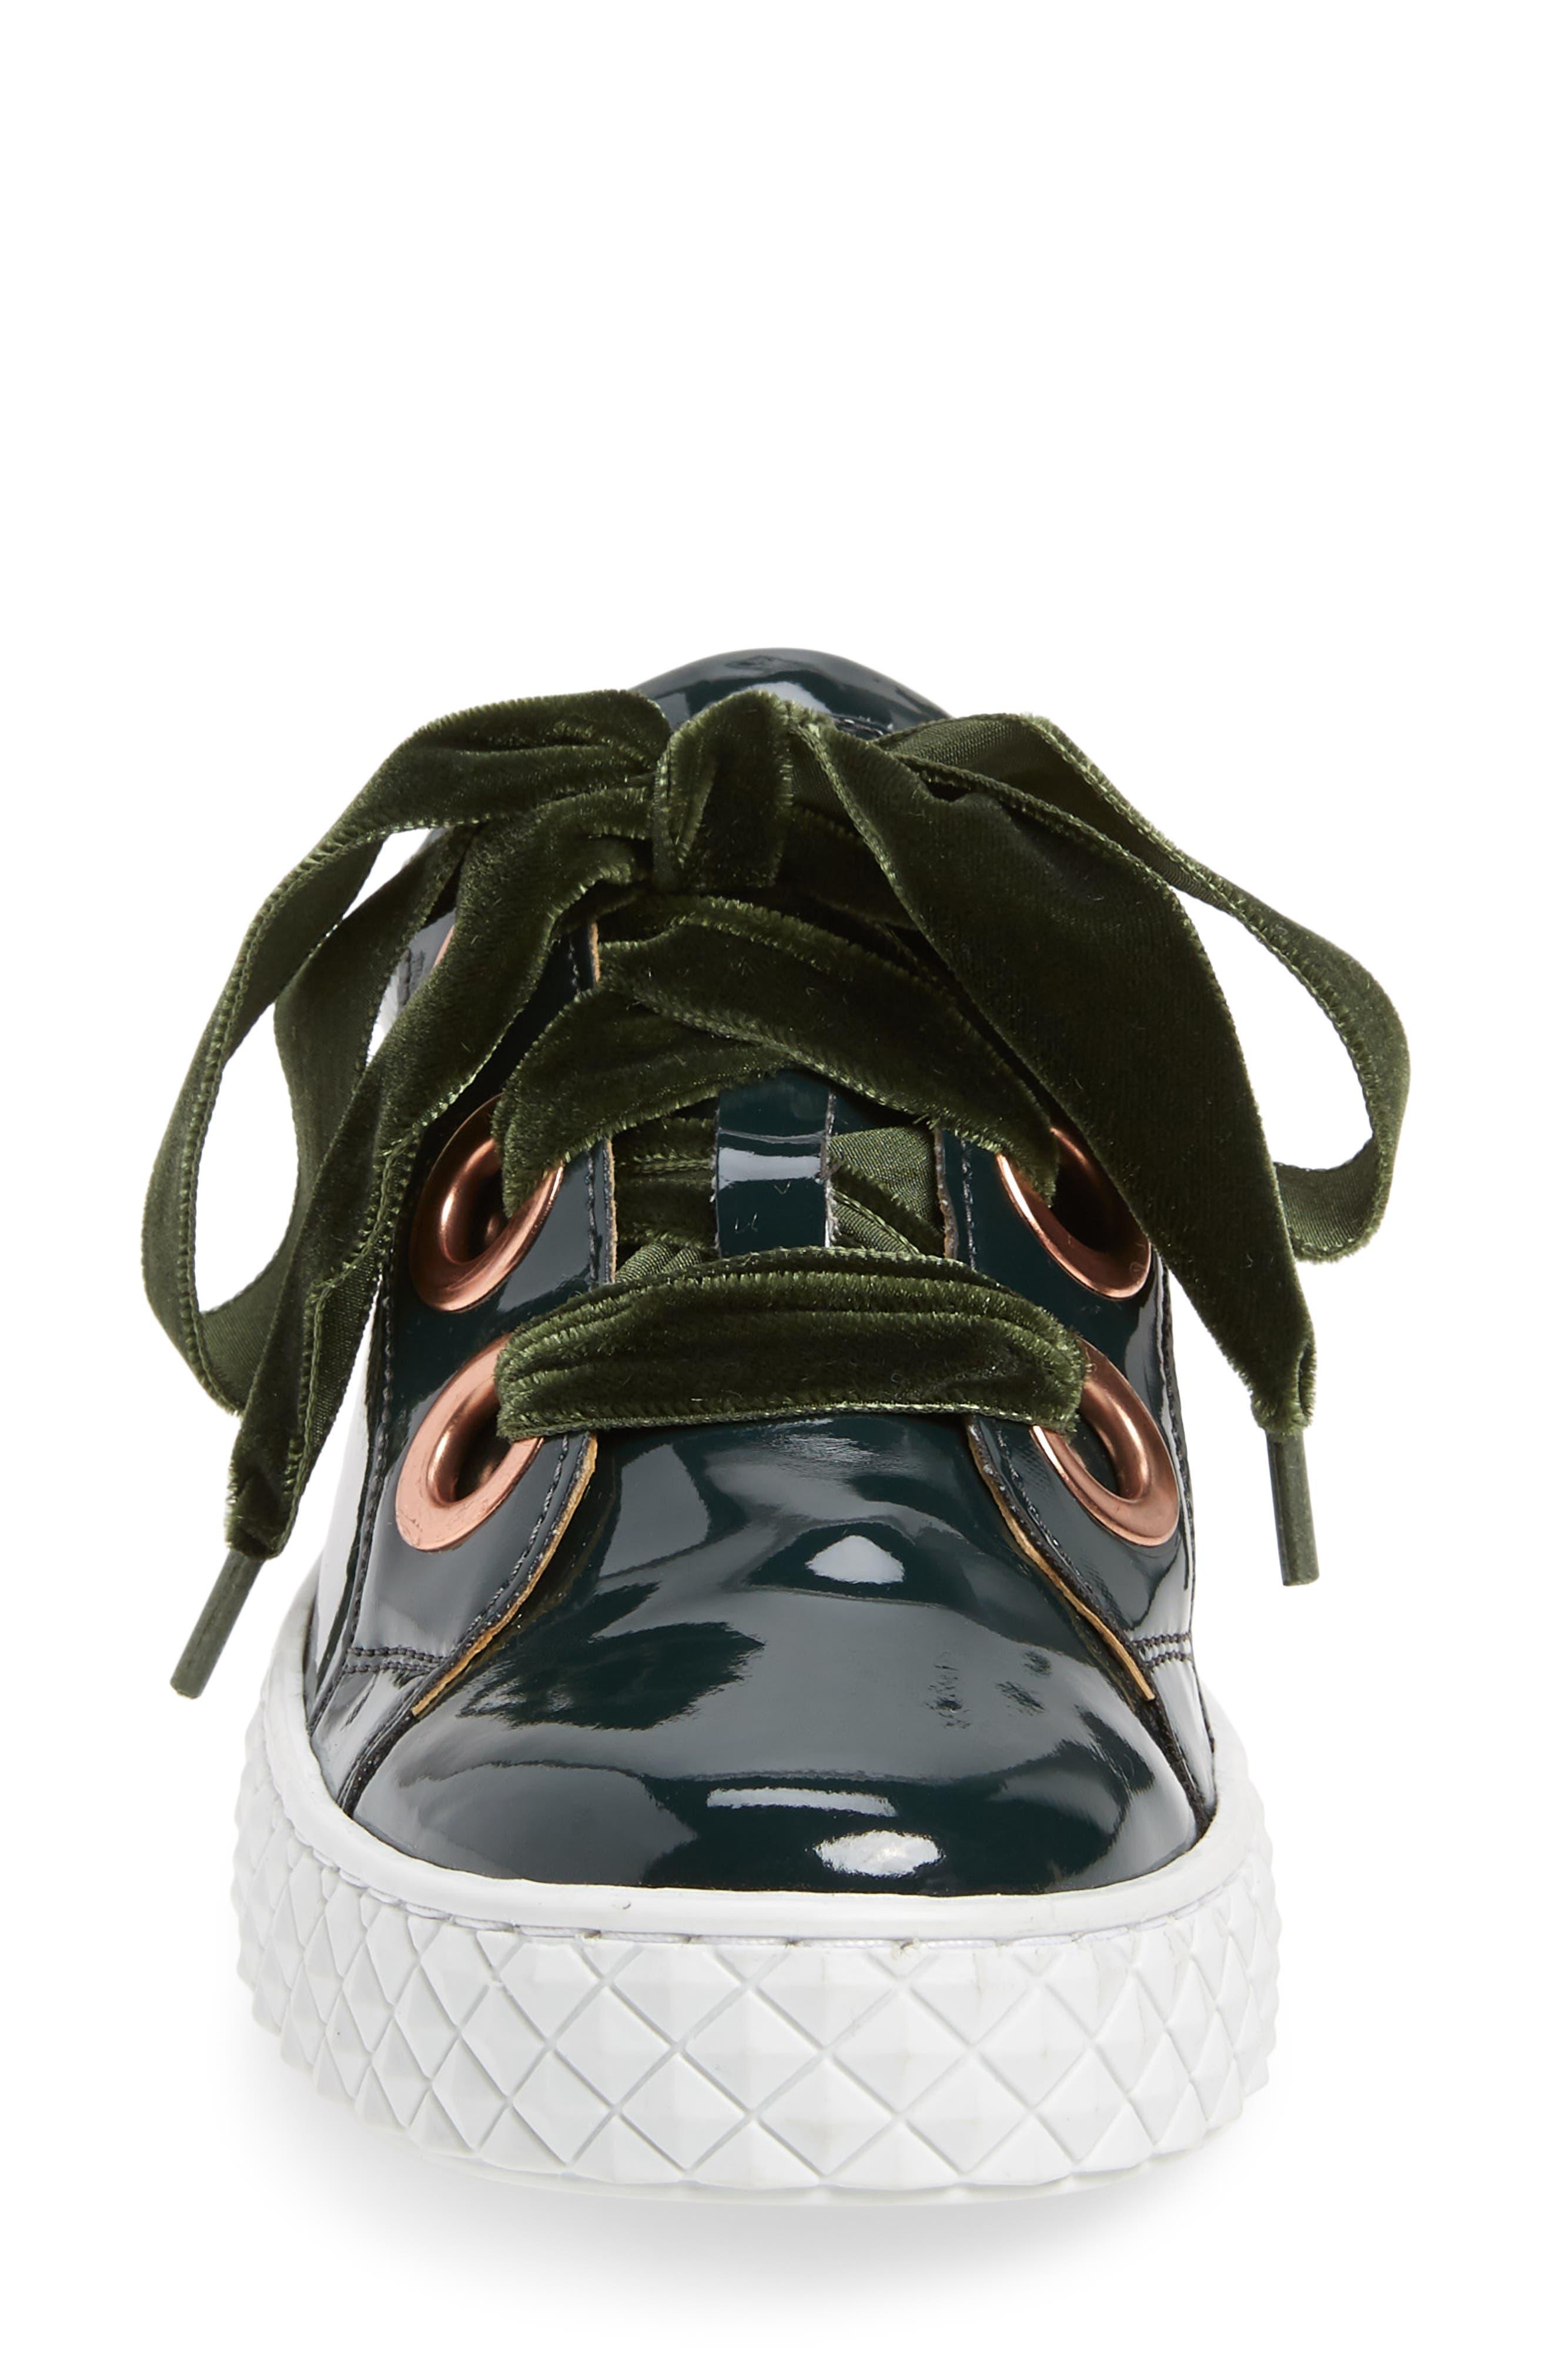 Acton III Sneaker,                             Alternate thumbnail 4, color,                             BOTTLE GREEN LEATHER